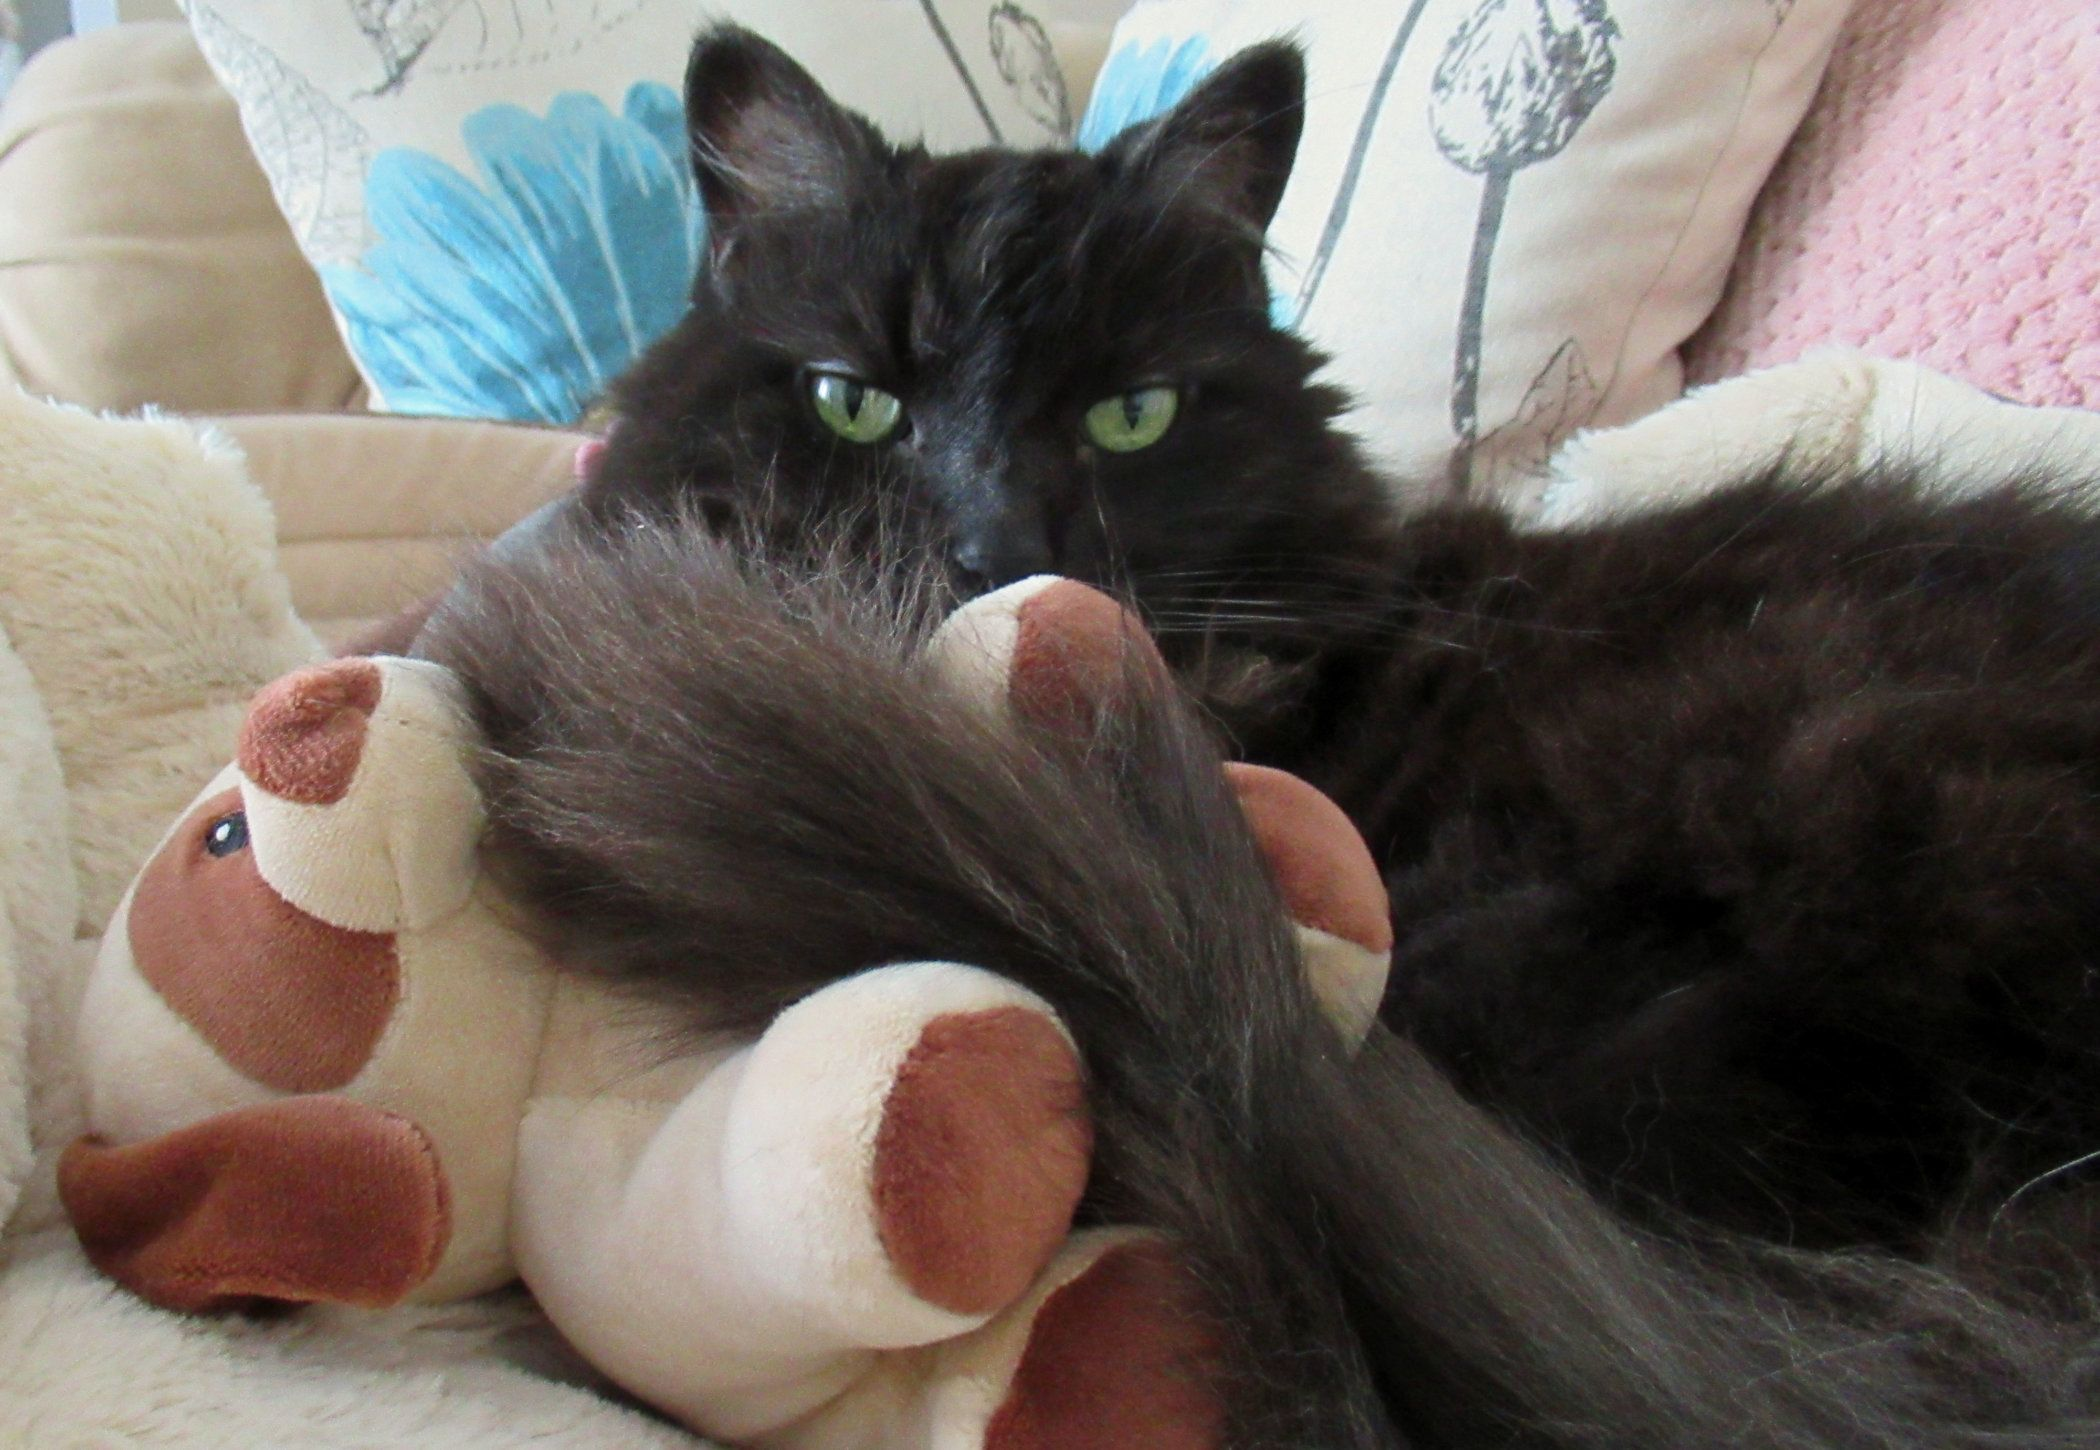 How Teddy Is Finding Comfort After Losing His Brother Katzenworld In 2020 Feline Pet Pet News Your Pet